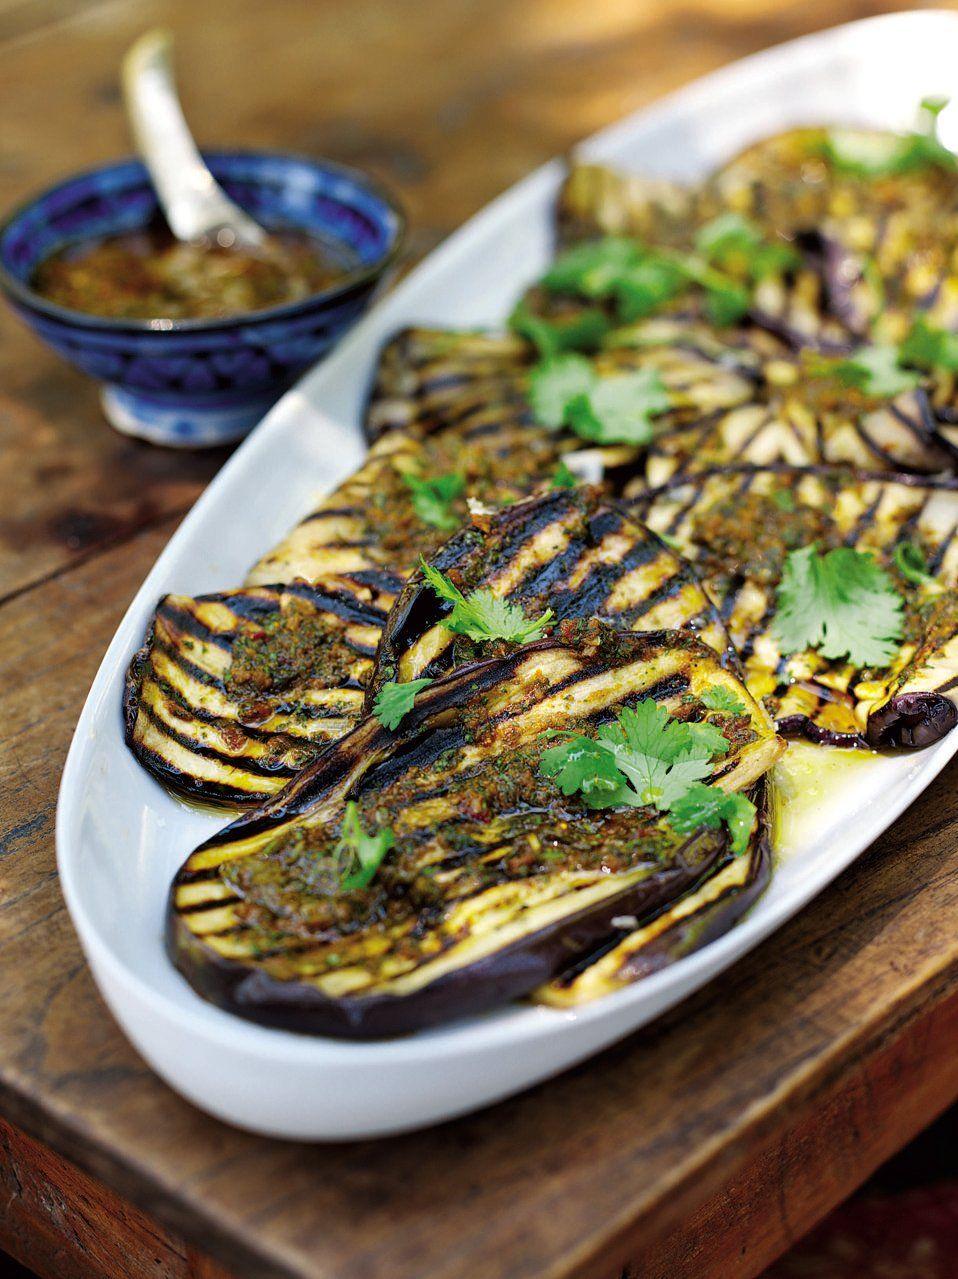 Chermoula is a spicy Arabic recipe involving harissa, saffron, paprika, lemon and mint.